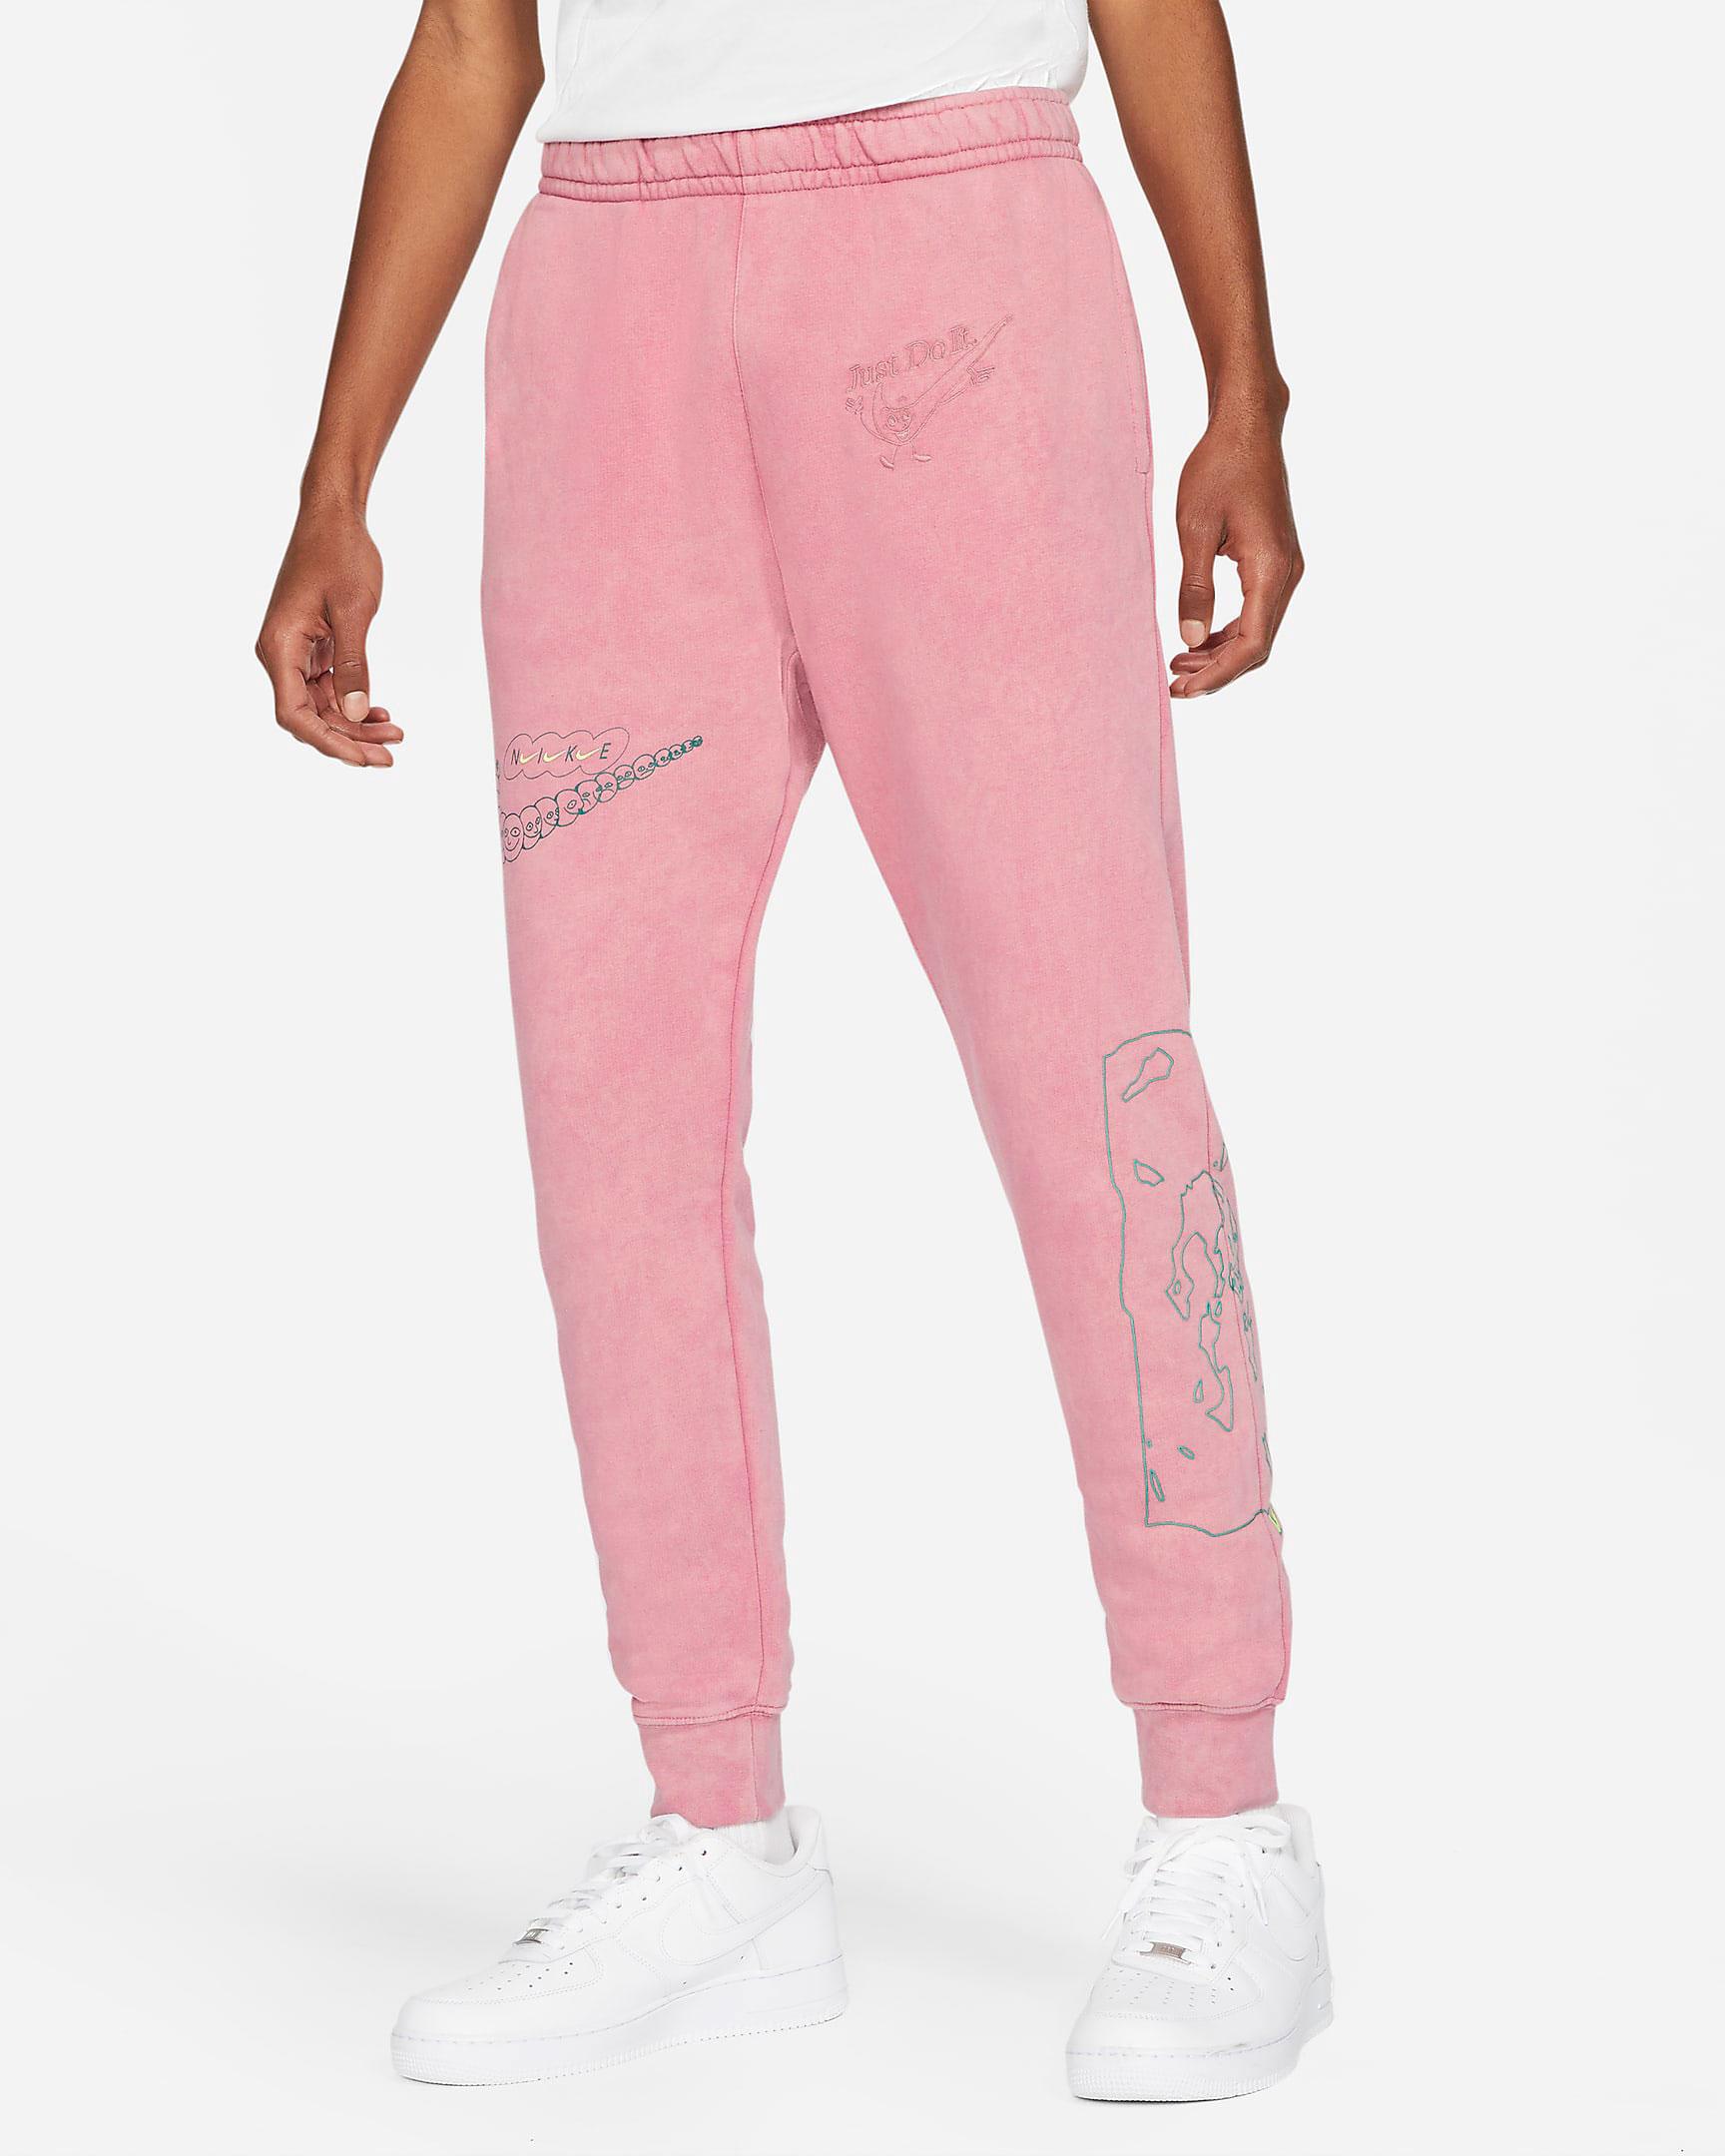 nike-air-max-1-strawberry-lemonade-jogger-pants-1